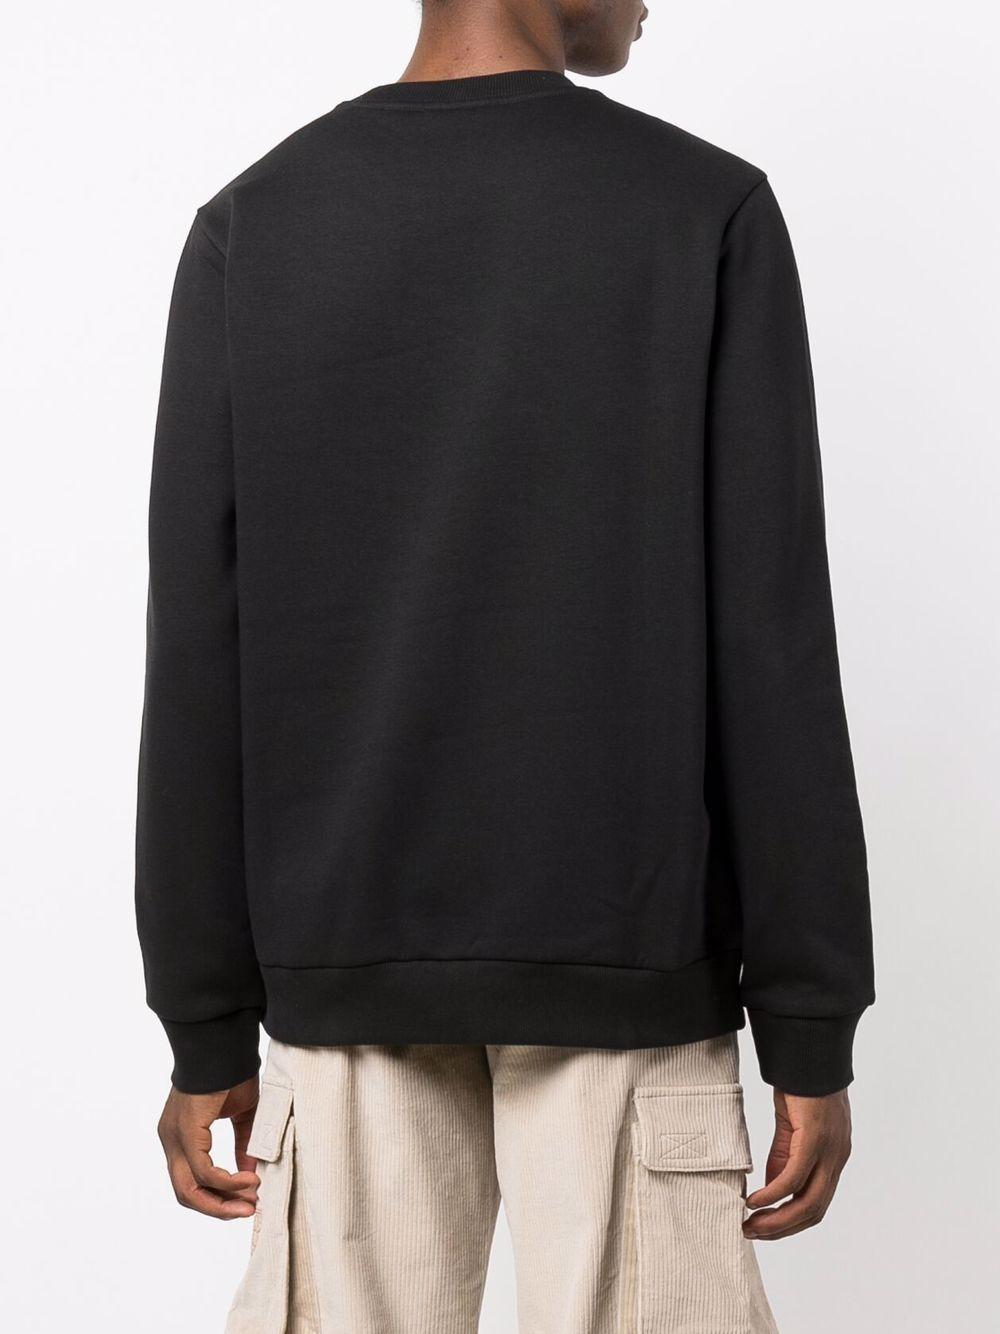 logo sweatshirt man black in cotton DICKIES | Sweatshirts | DK0A4XCIBLK